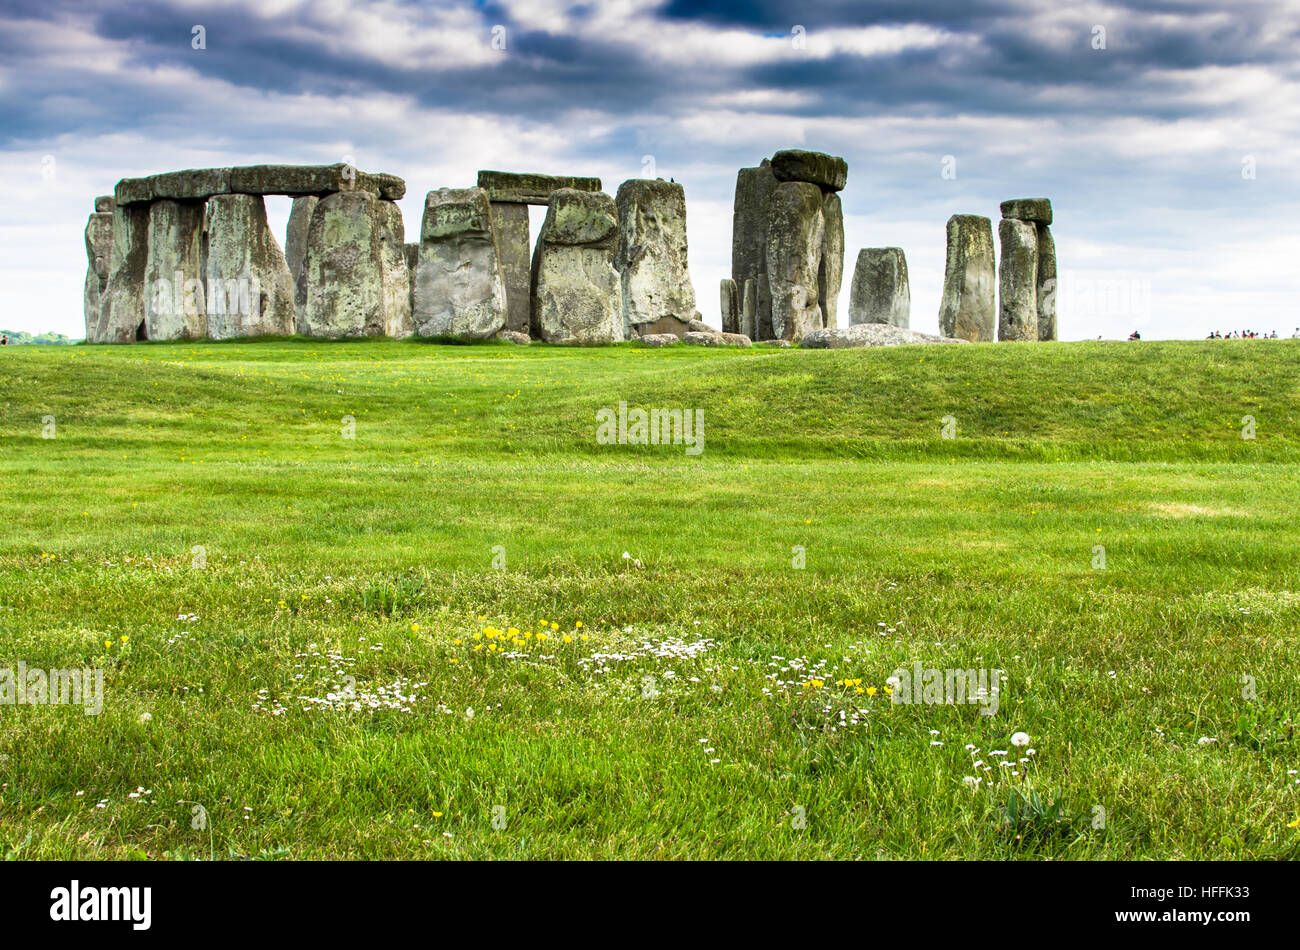 Lush green fields by prehistoric Stonehenge in Salisbury, England - Stock Image